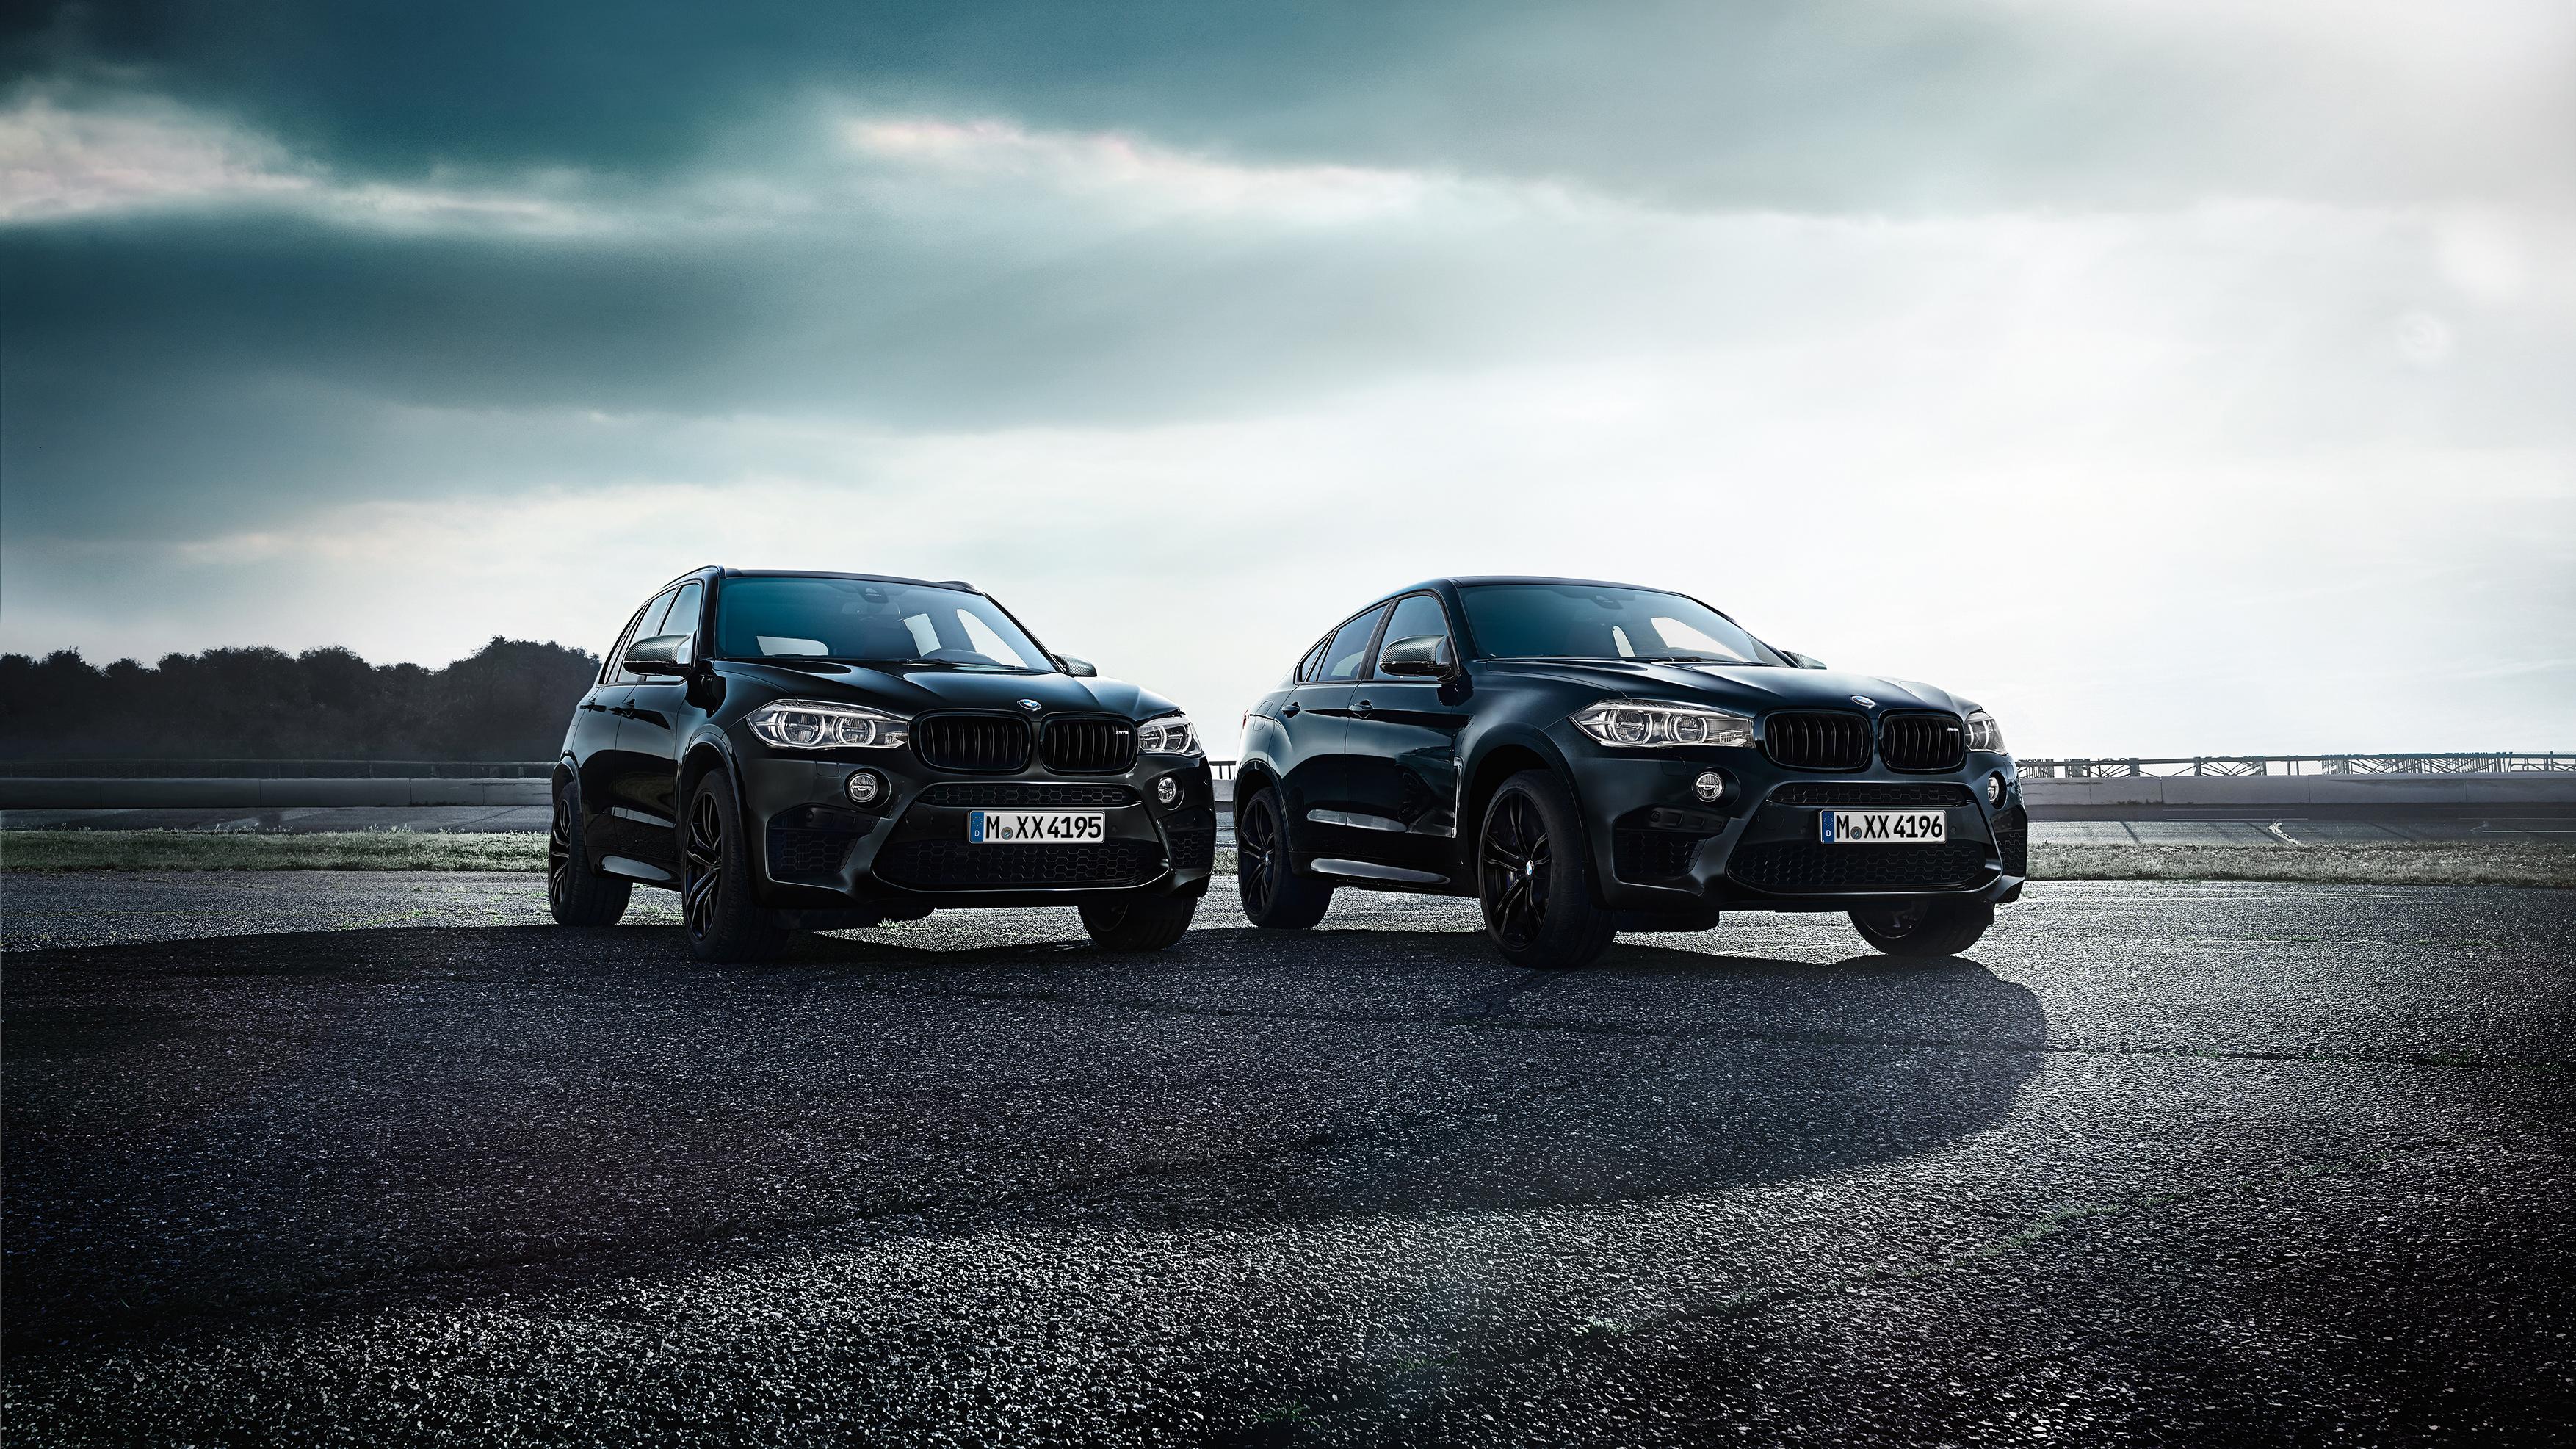 BMW X5 and X6 M Edition Black Fire 2017 Wallpaper | HD Car ...